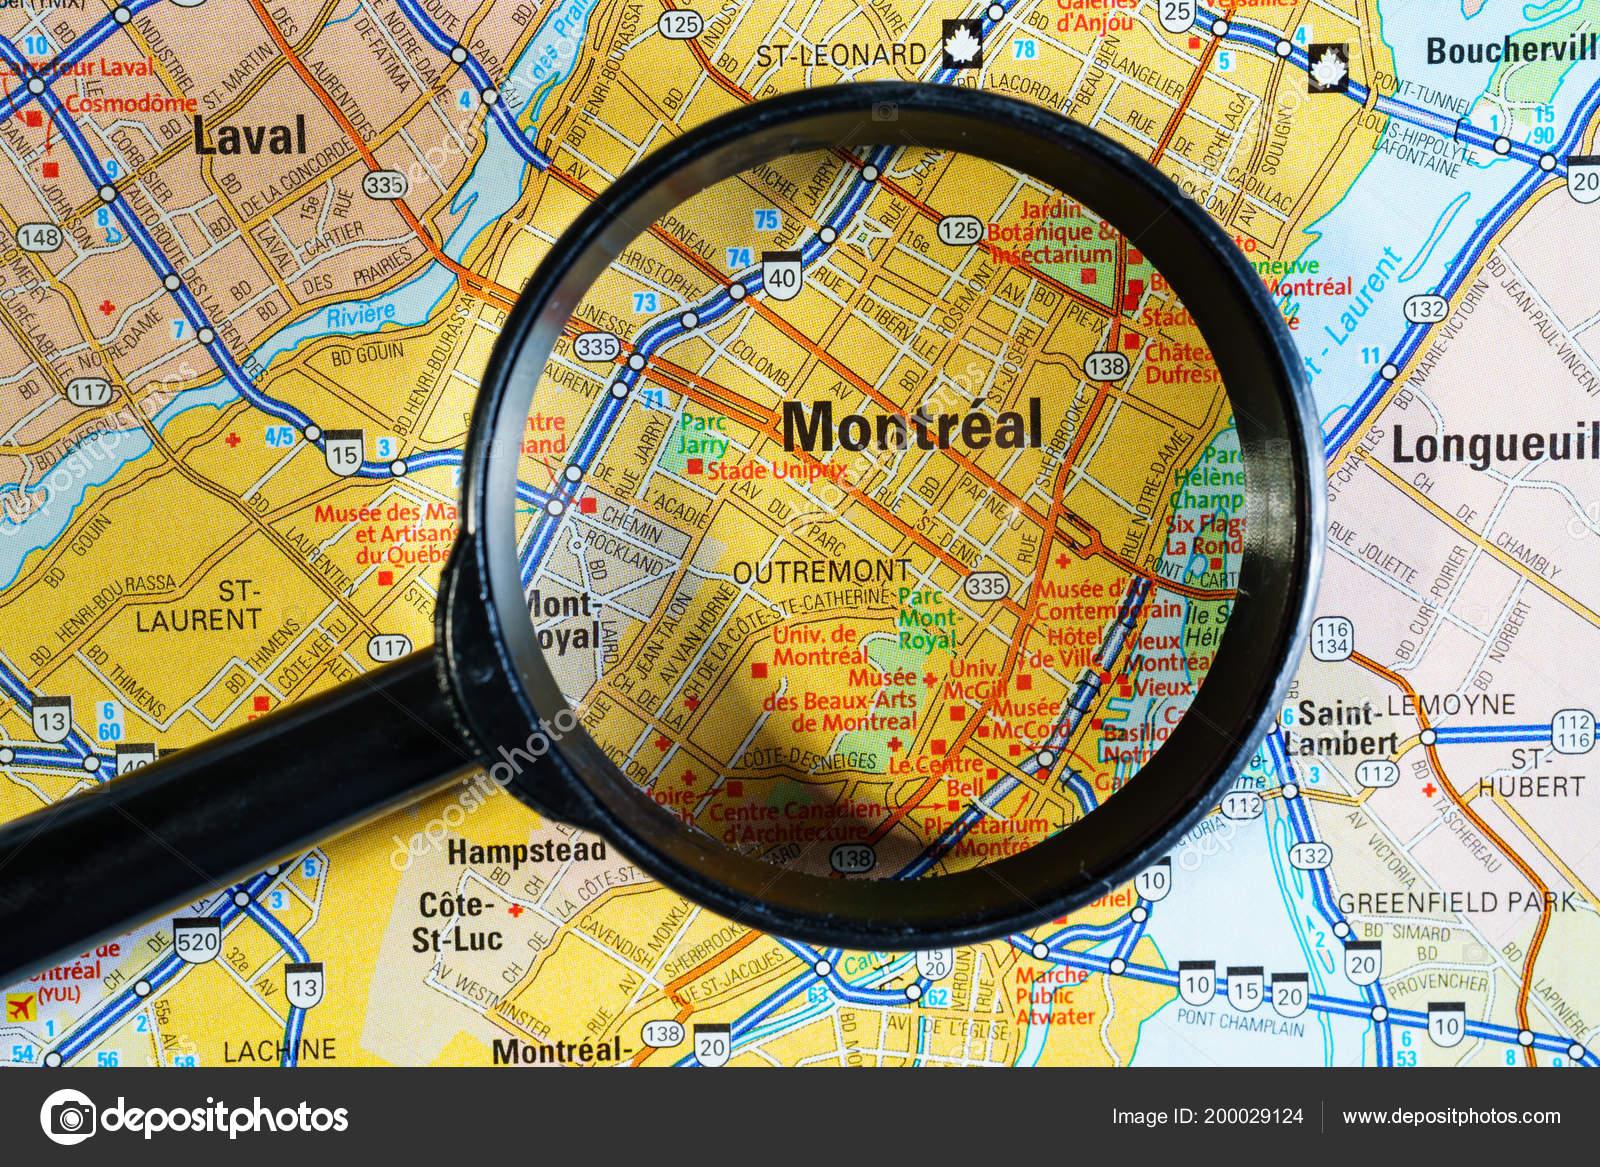 Montreal Canada Map — Stock Photo © aallm #200029124 on map of halifax nova scotia canada, map of okanagan valley canada, map of grande prairie canada, niagara falls, british columbia, quebec city, map of sault ste marie canada, map of us and canada, map of goose bay canada, québec, map of quebec, map of winnipeg canada, map of muskoka canada, map of new france canada, map of kitchener canada, old montreal, montreal canadiens, map of ottawa canada, mcgill university, map of florida canada, map of mont tremblant canada, mexico city, nova scotia, map of gaspe canada, map of newfoundland canada, map of providence canada, map of white rock canada, map of glace bay canada, map of valleyfield canada,